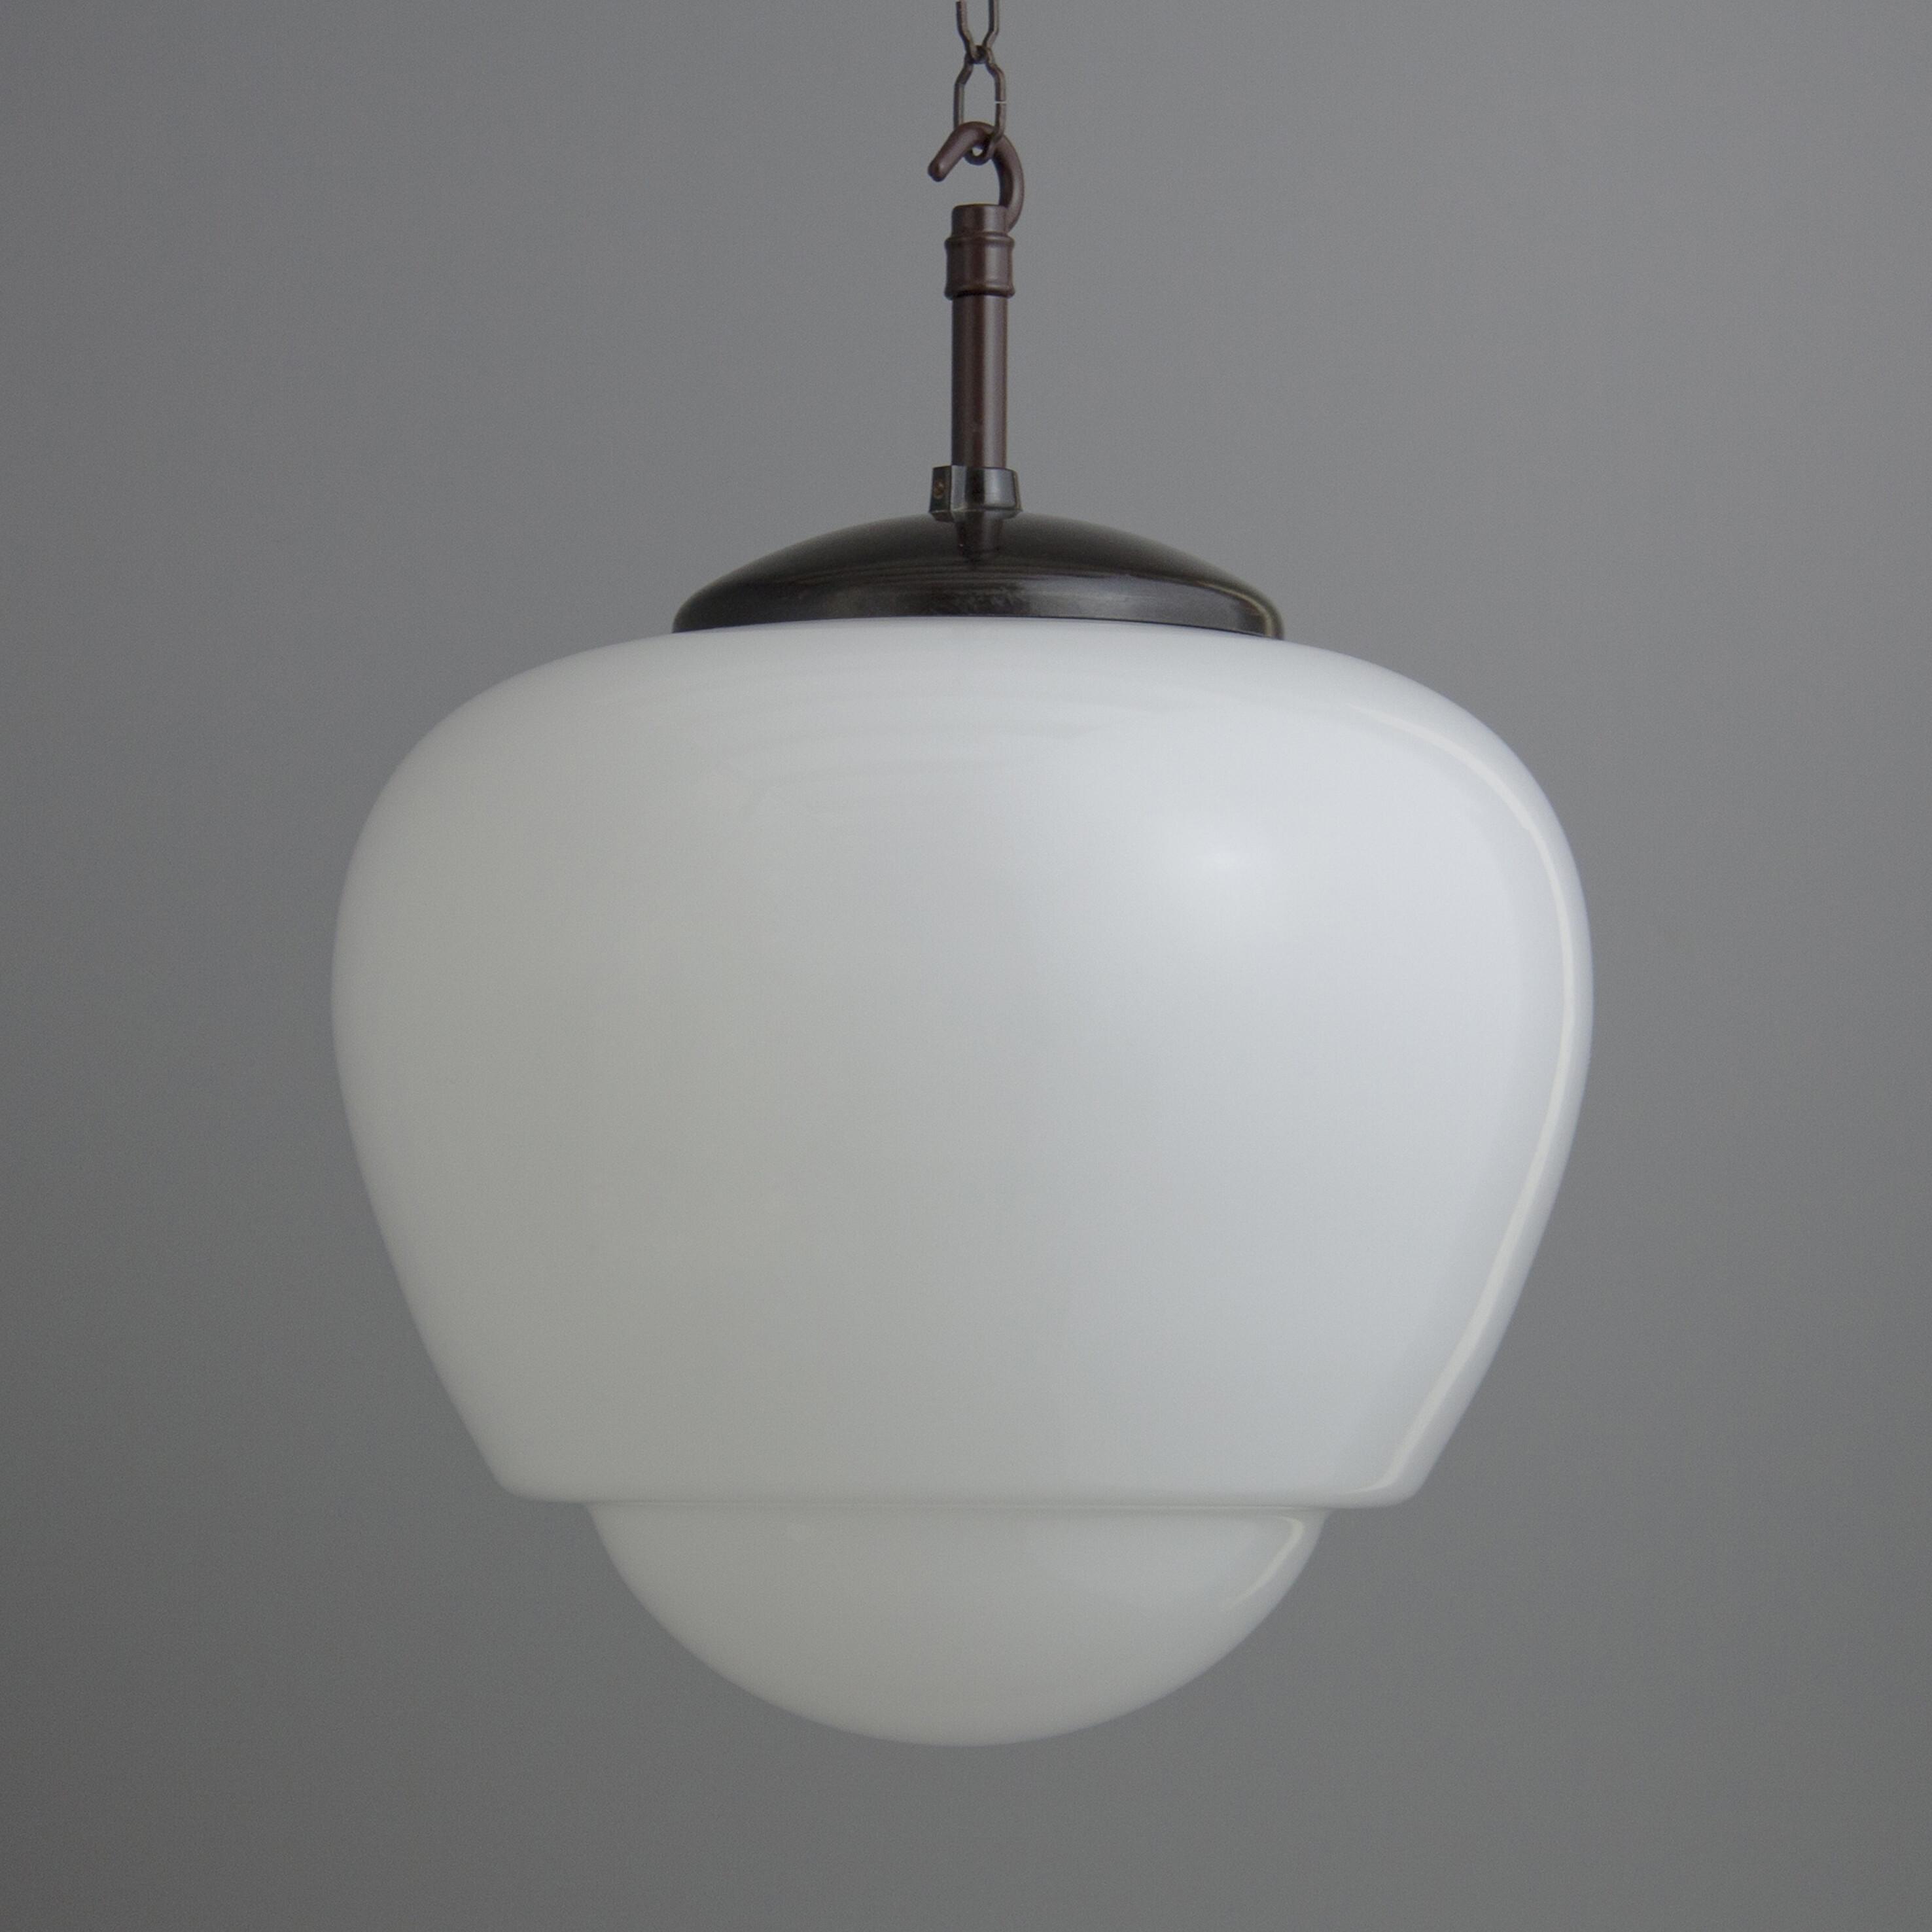 Elegant glass & bakelite teardrop pendants